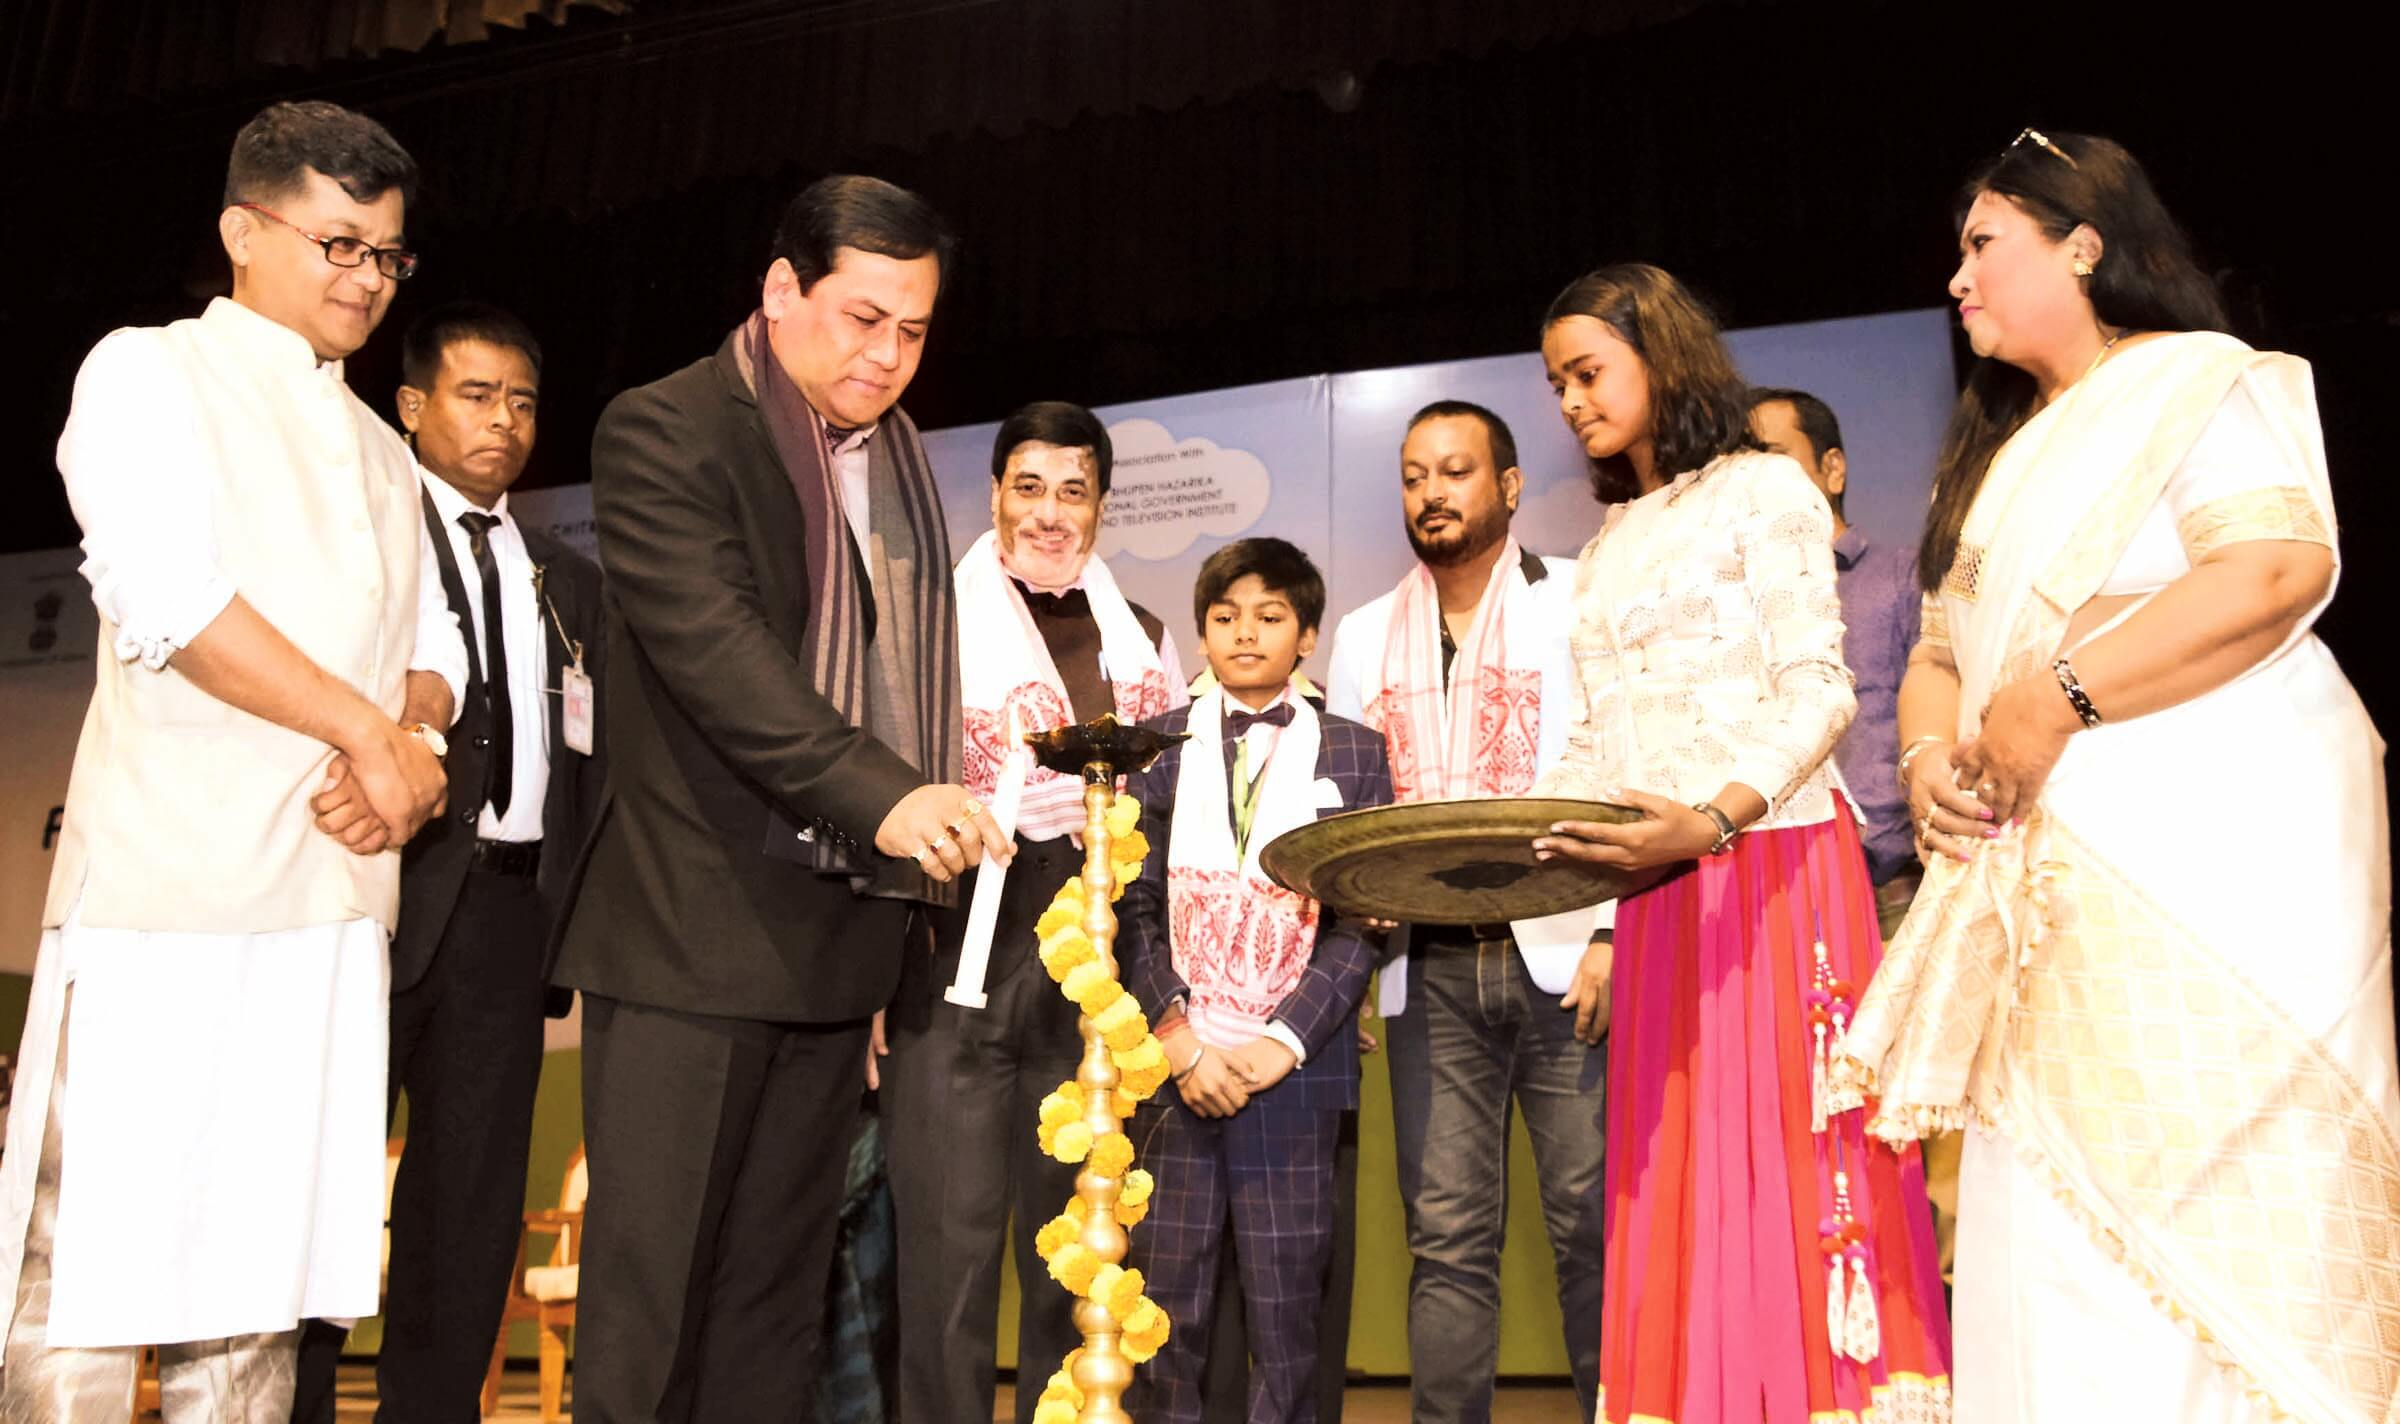 Overwhelming response in opening day of Guwahati International Children Film Festival